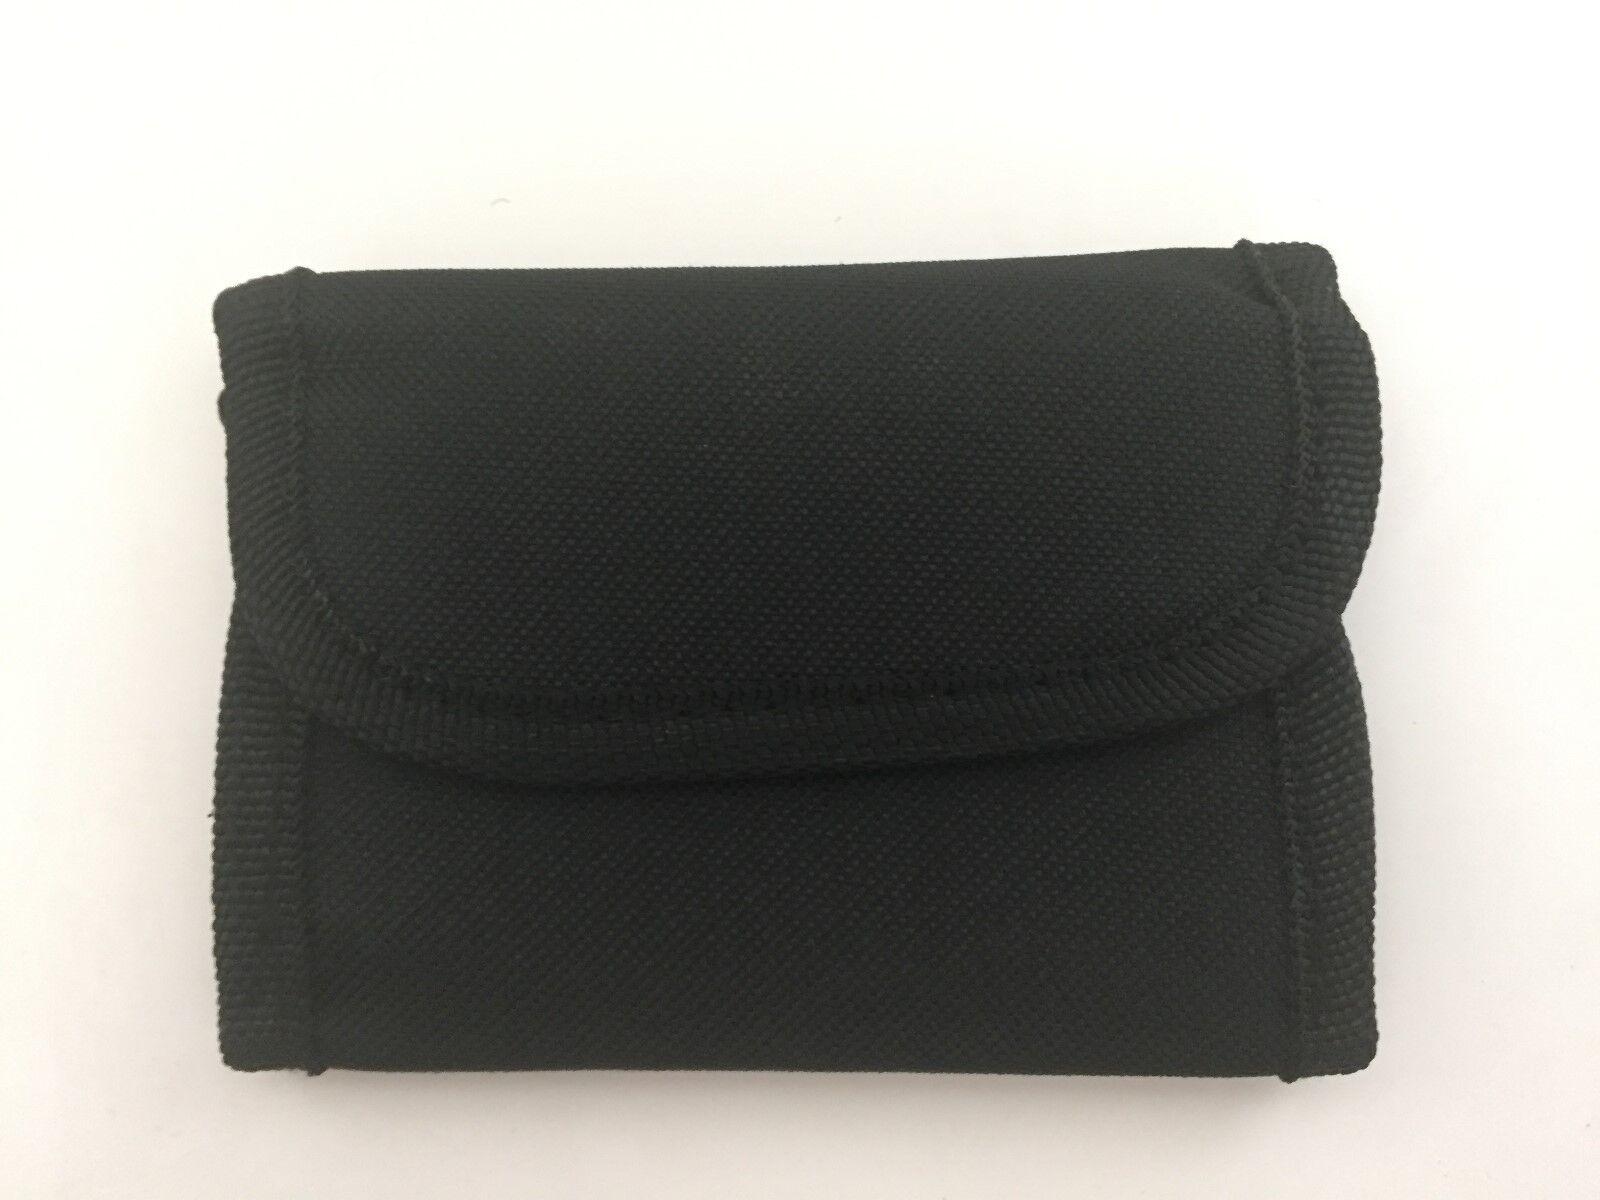 2-Soft Sided Unisex Wallet with Belt Strap-Black